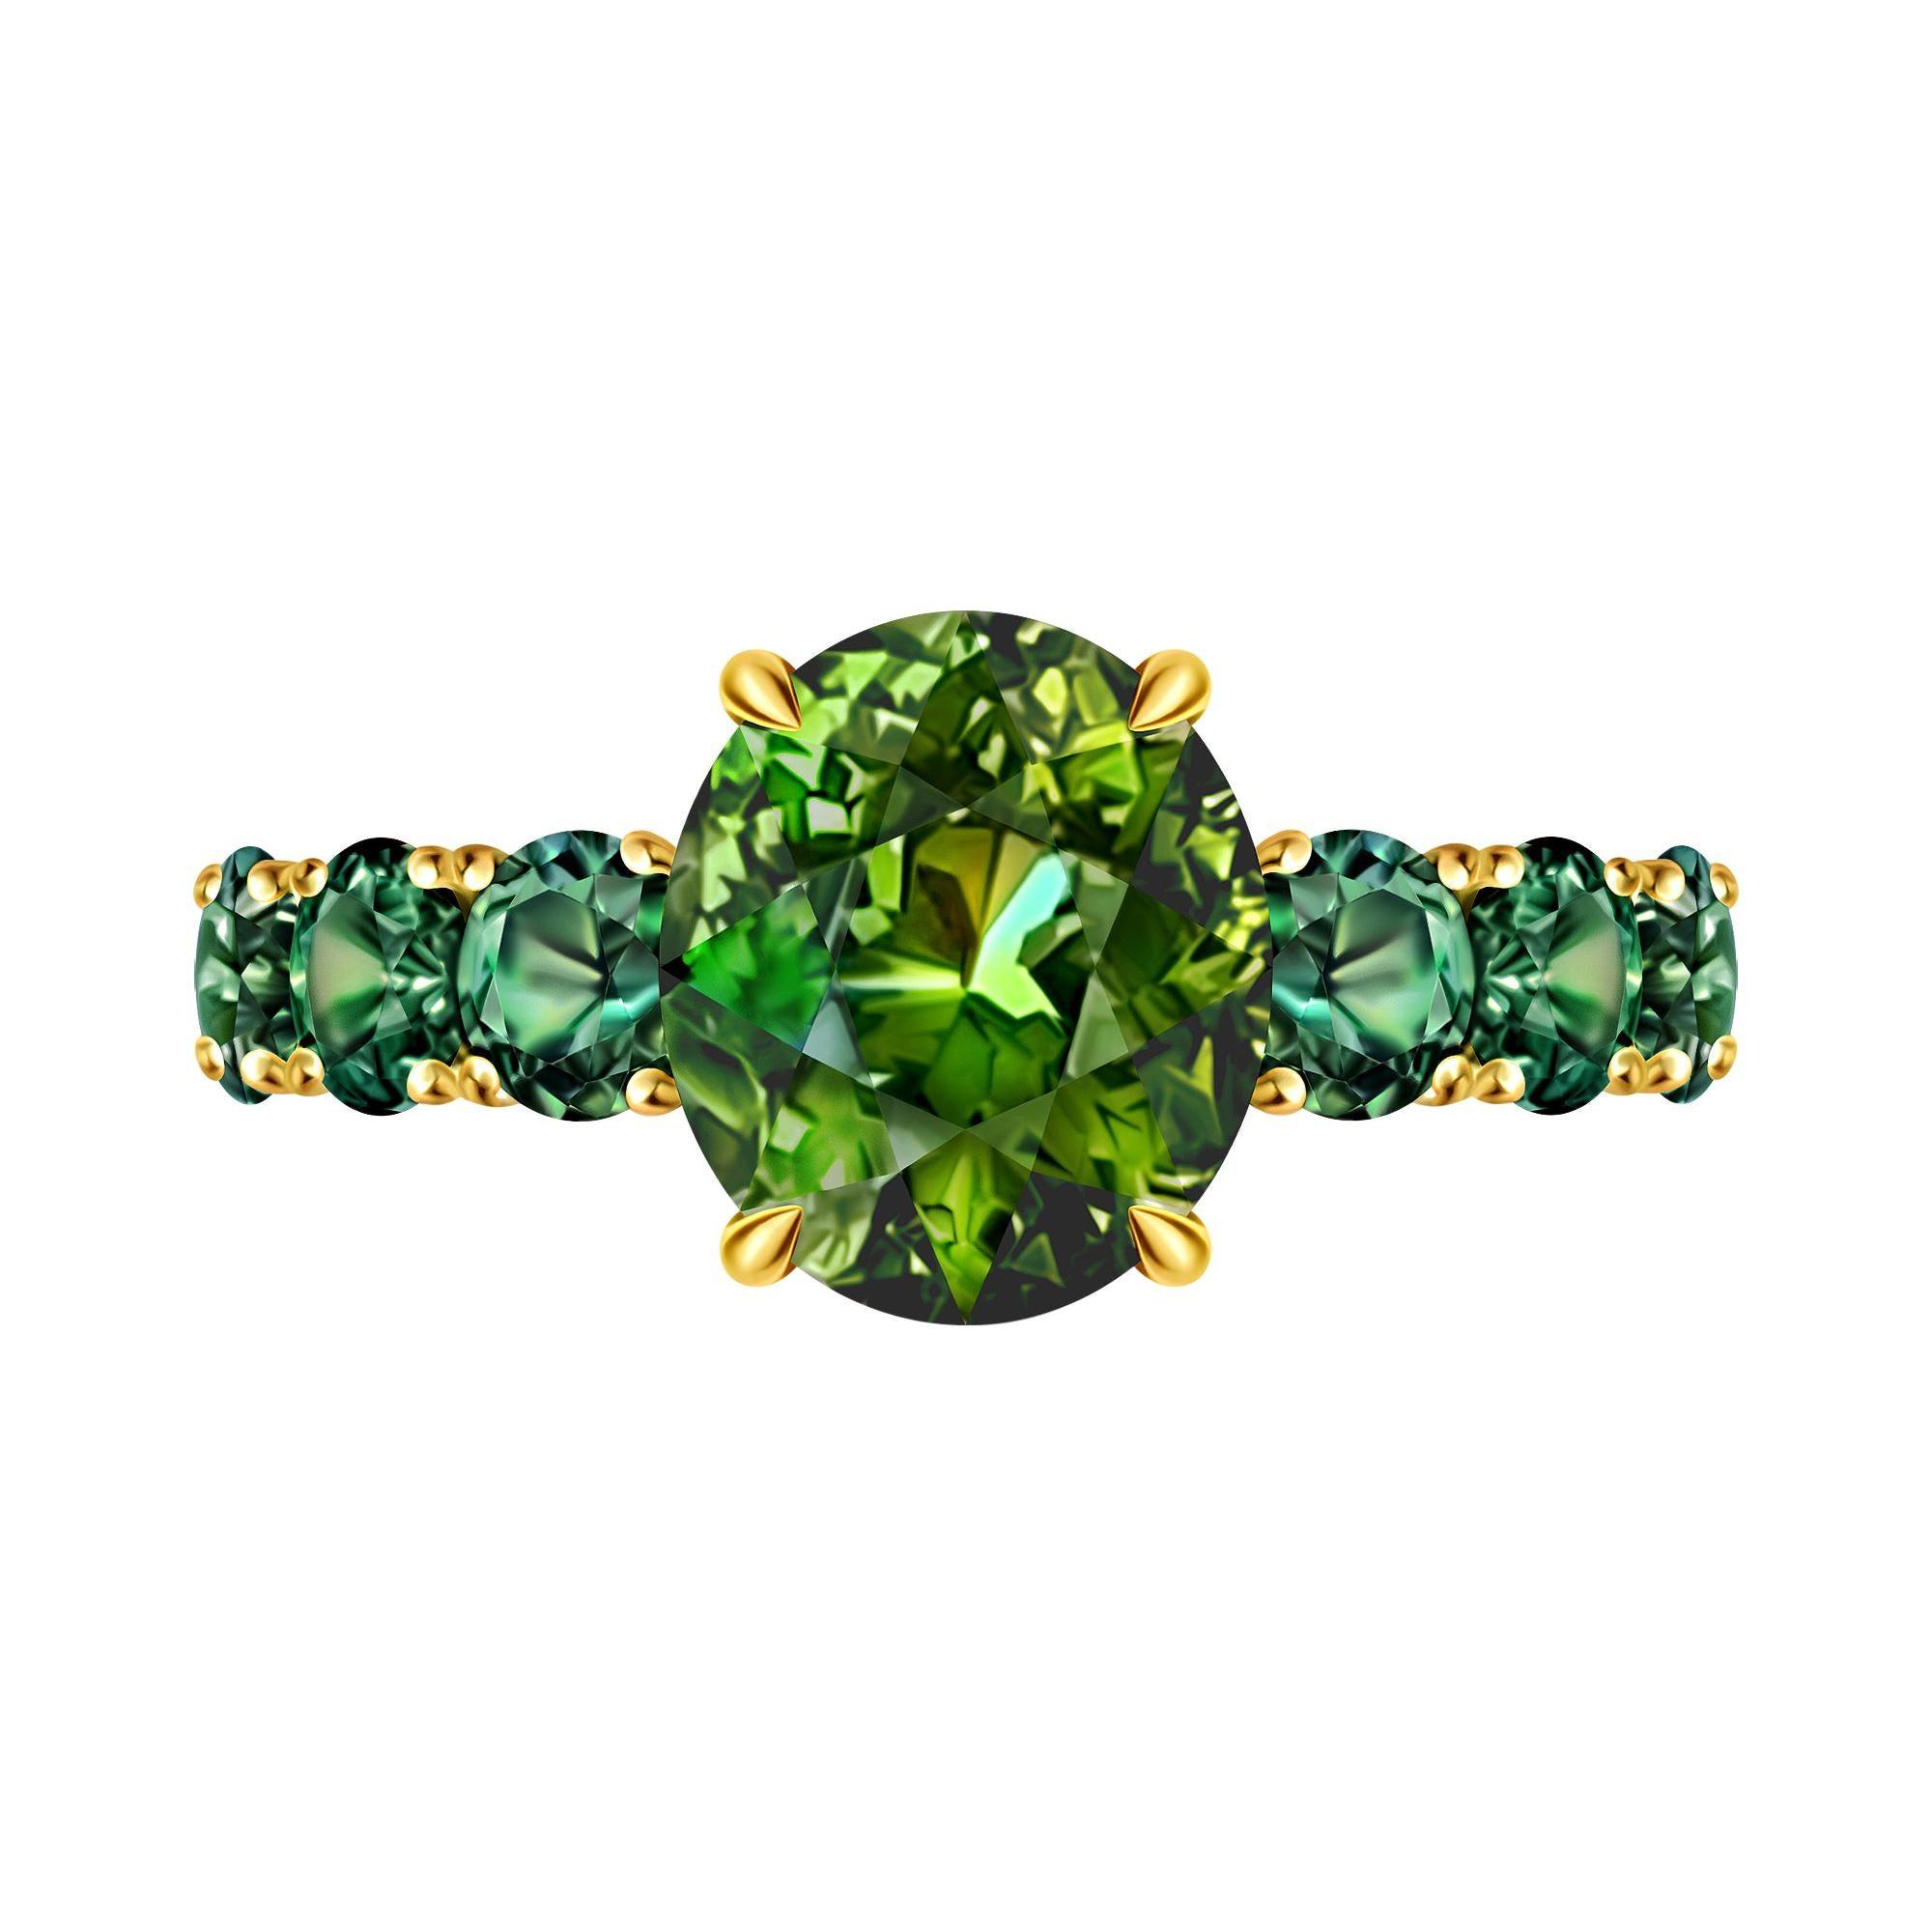 3,4 Carat Green Tourmaline Marriage Sapphire 18 Karat Gold Infinity Ring